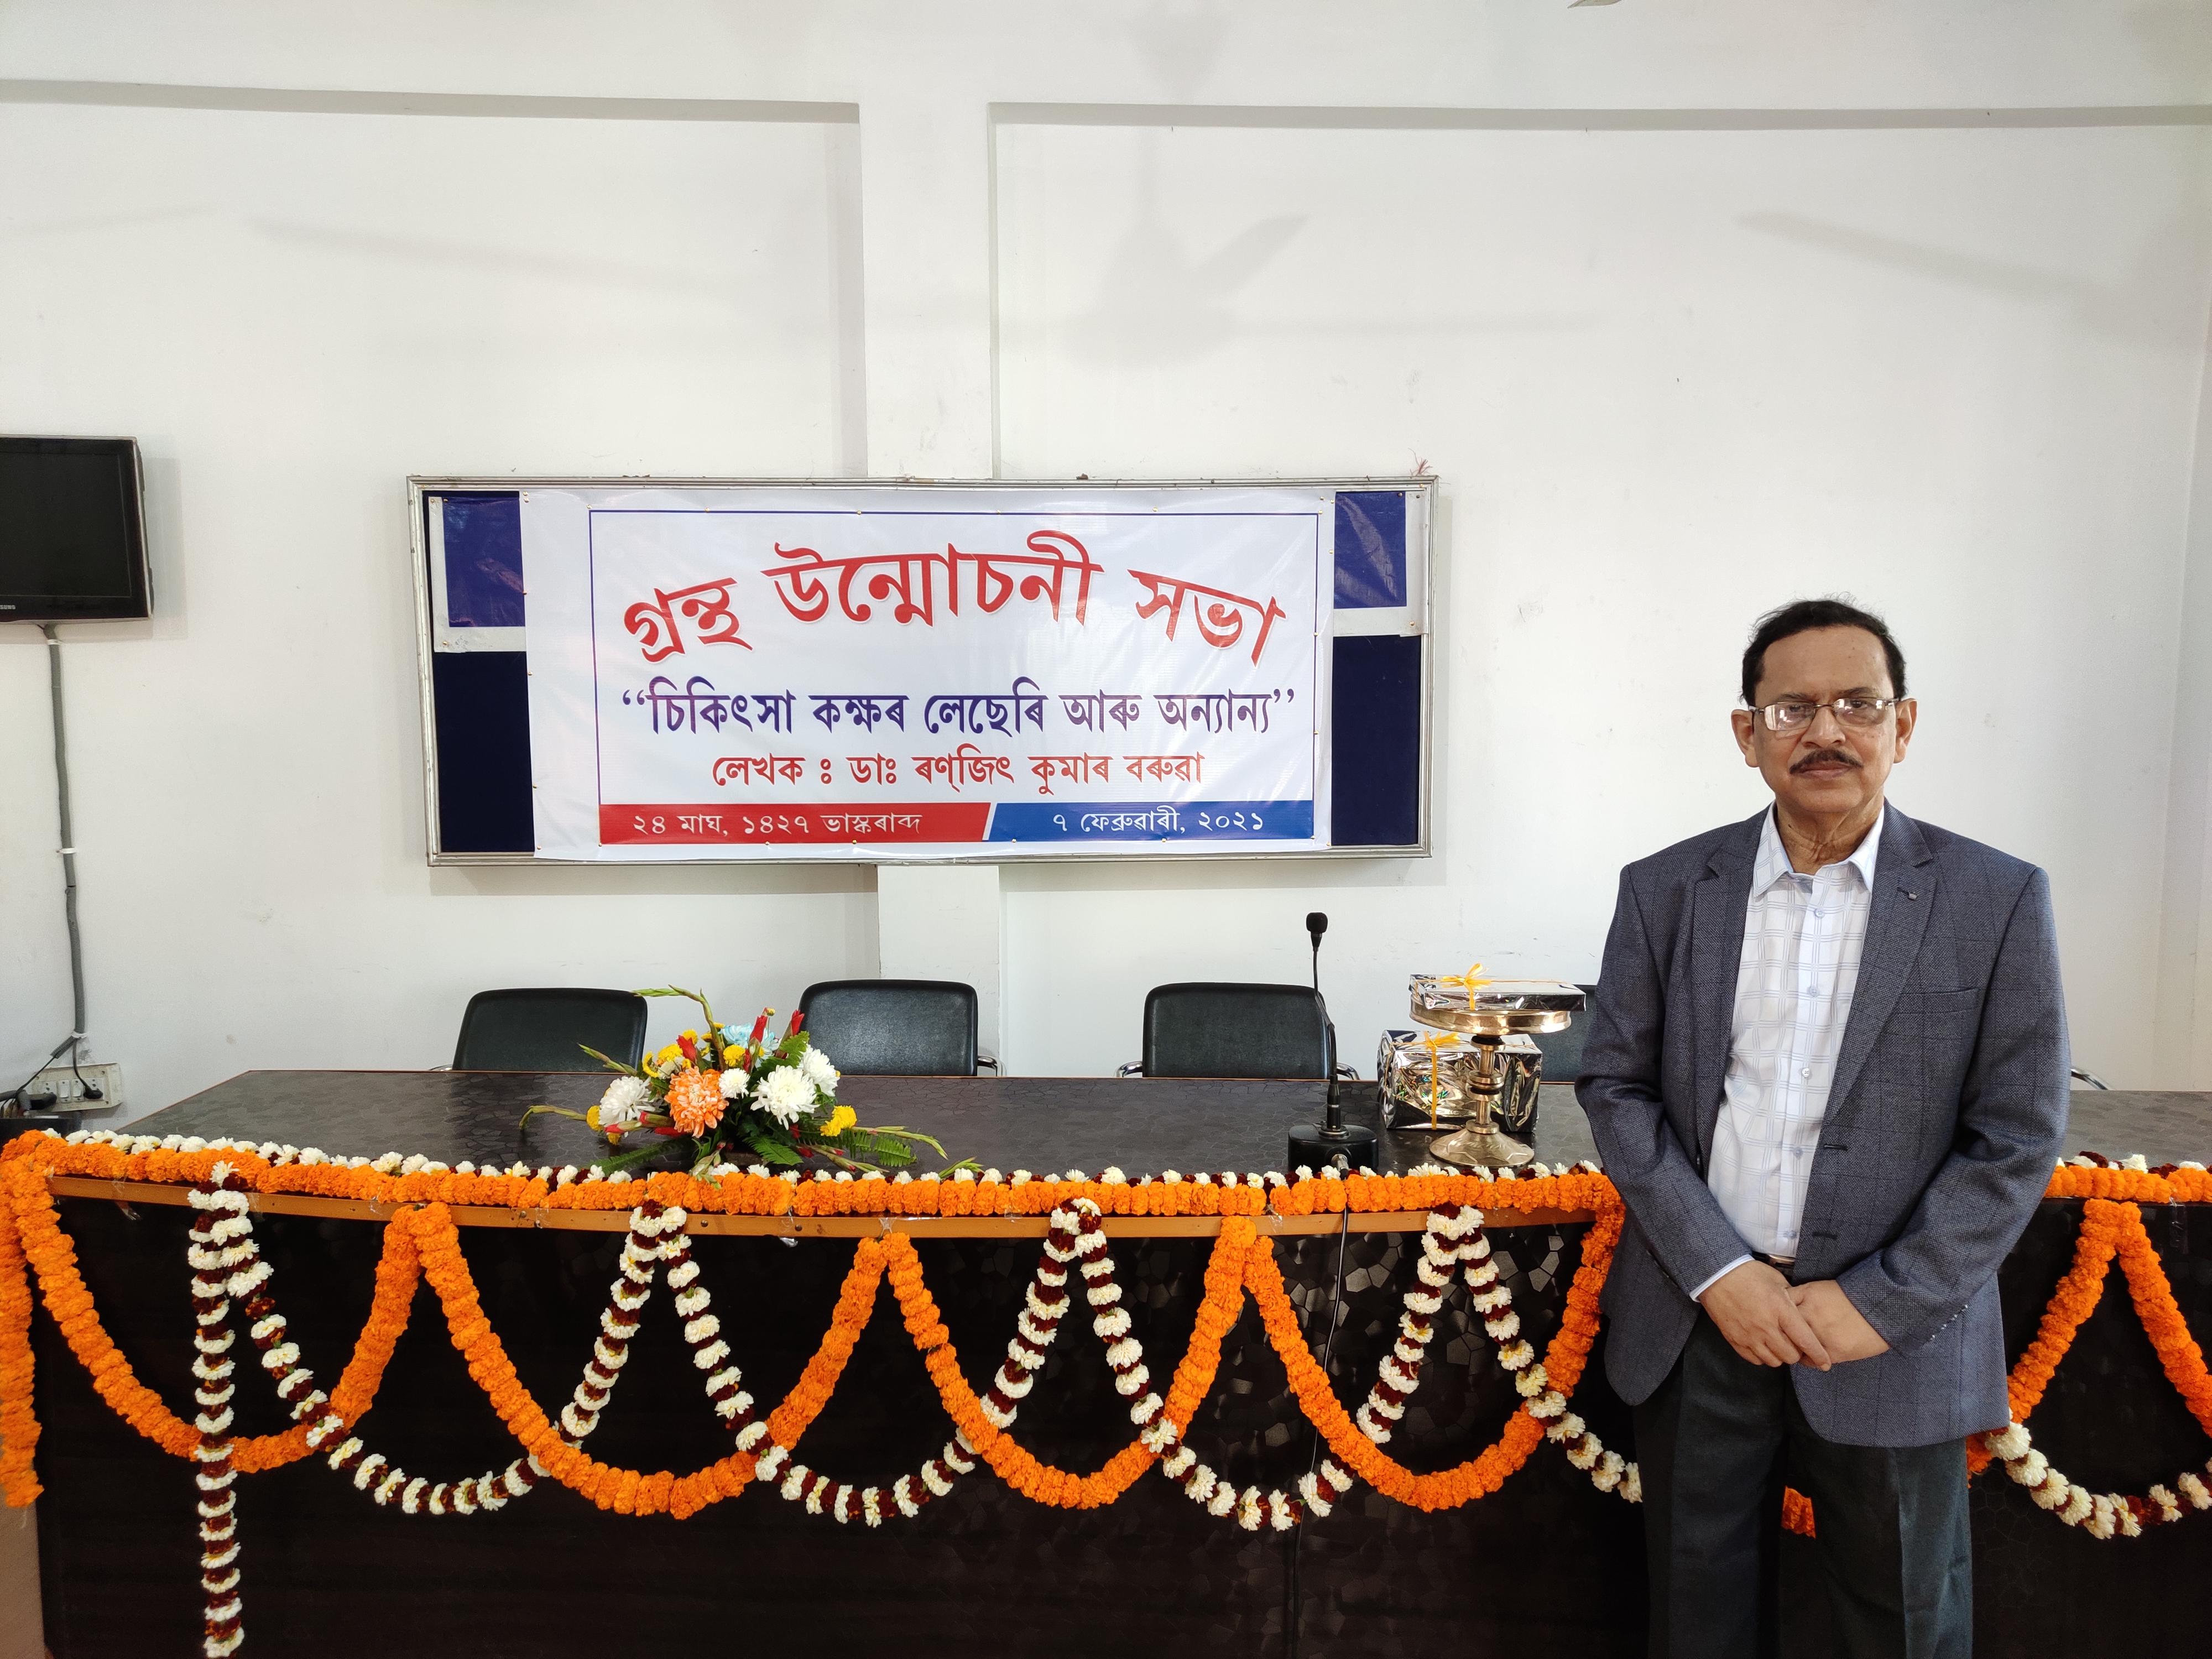 Dr. Ranjit Kumar Baruah